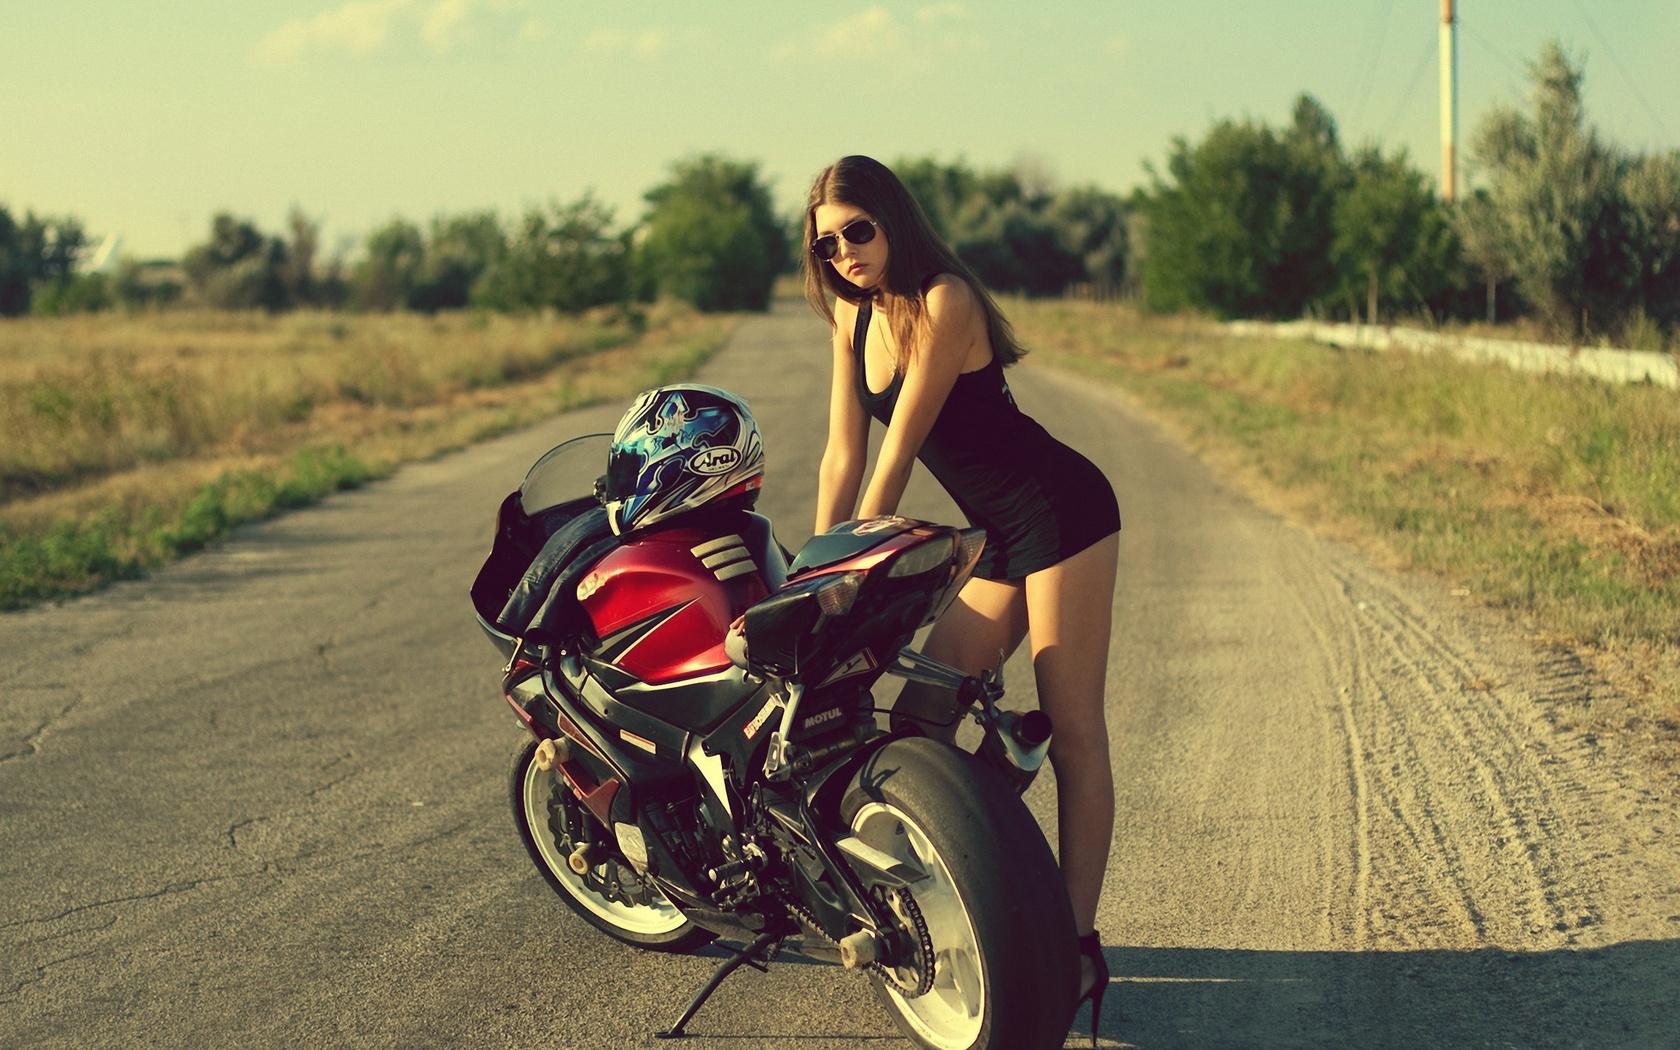 kartinki-devushki-vozle-mototsiklov